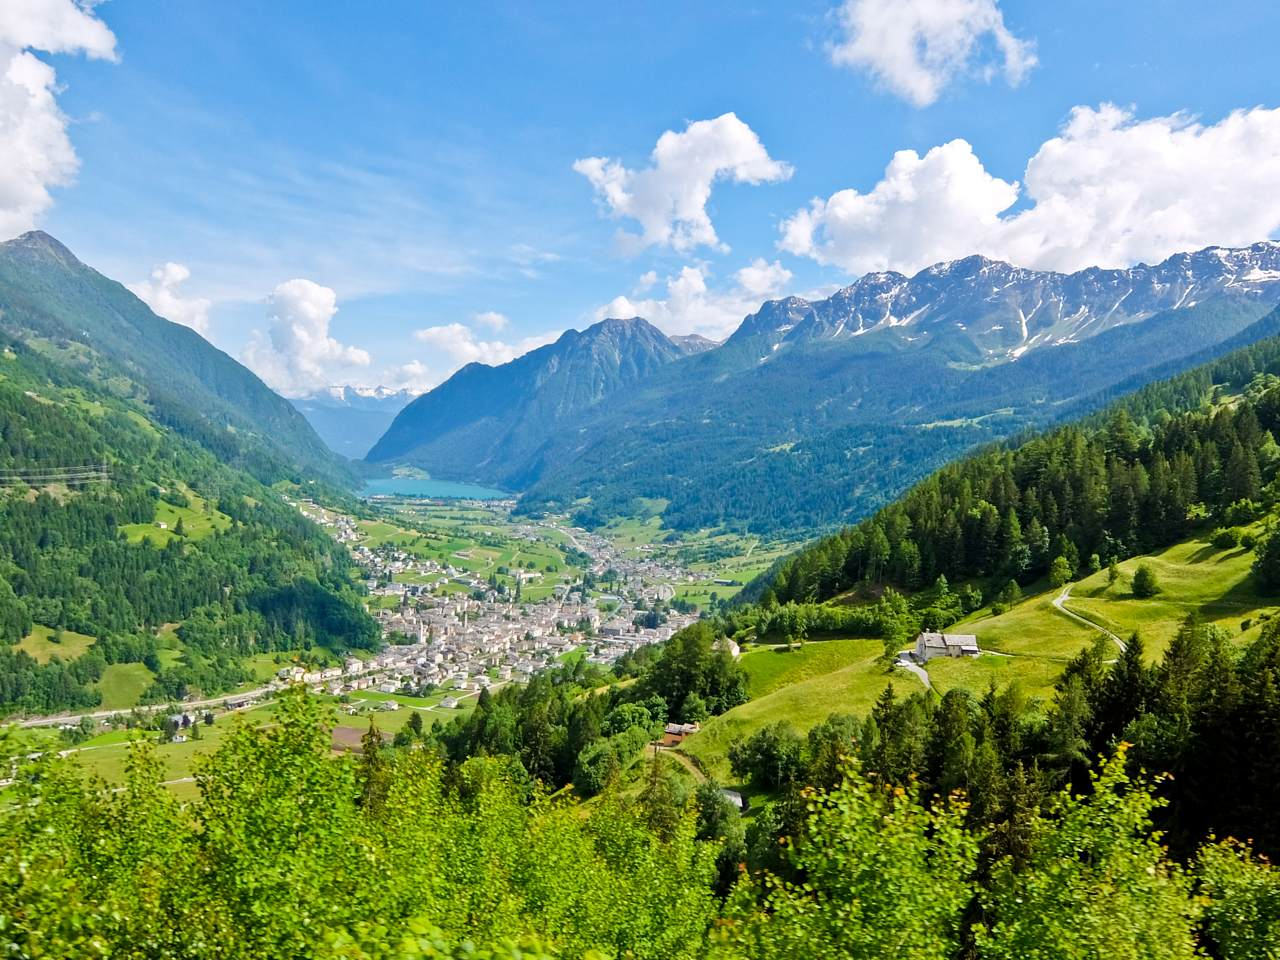 Lago di Poschiavo Valley  Over the Alps via Gotthard Bernina Circular Tour on the Bernina Express Lago di Poschiavo Valley